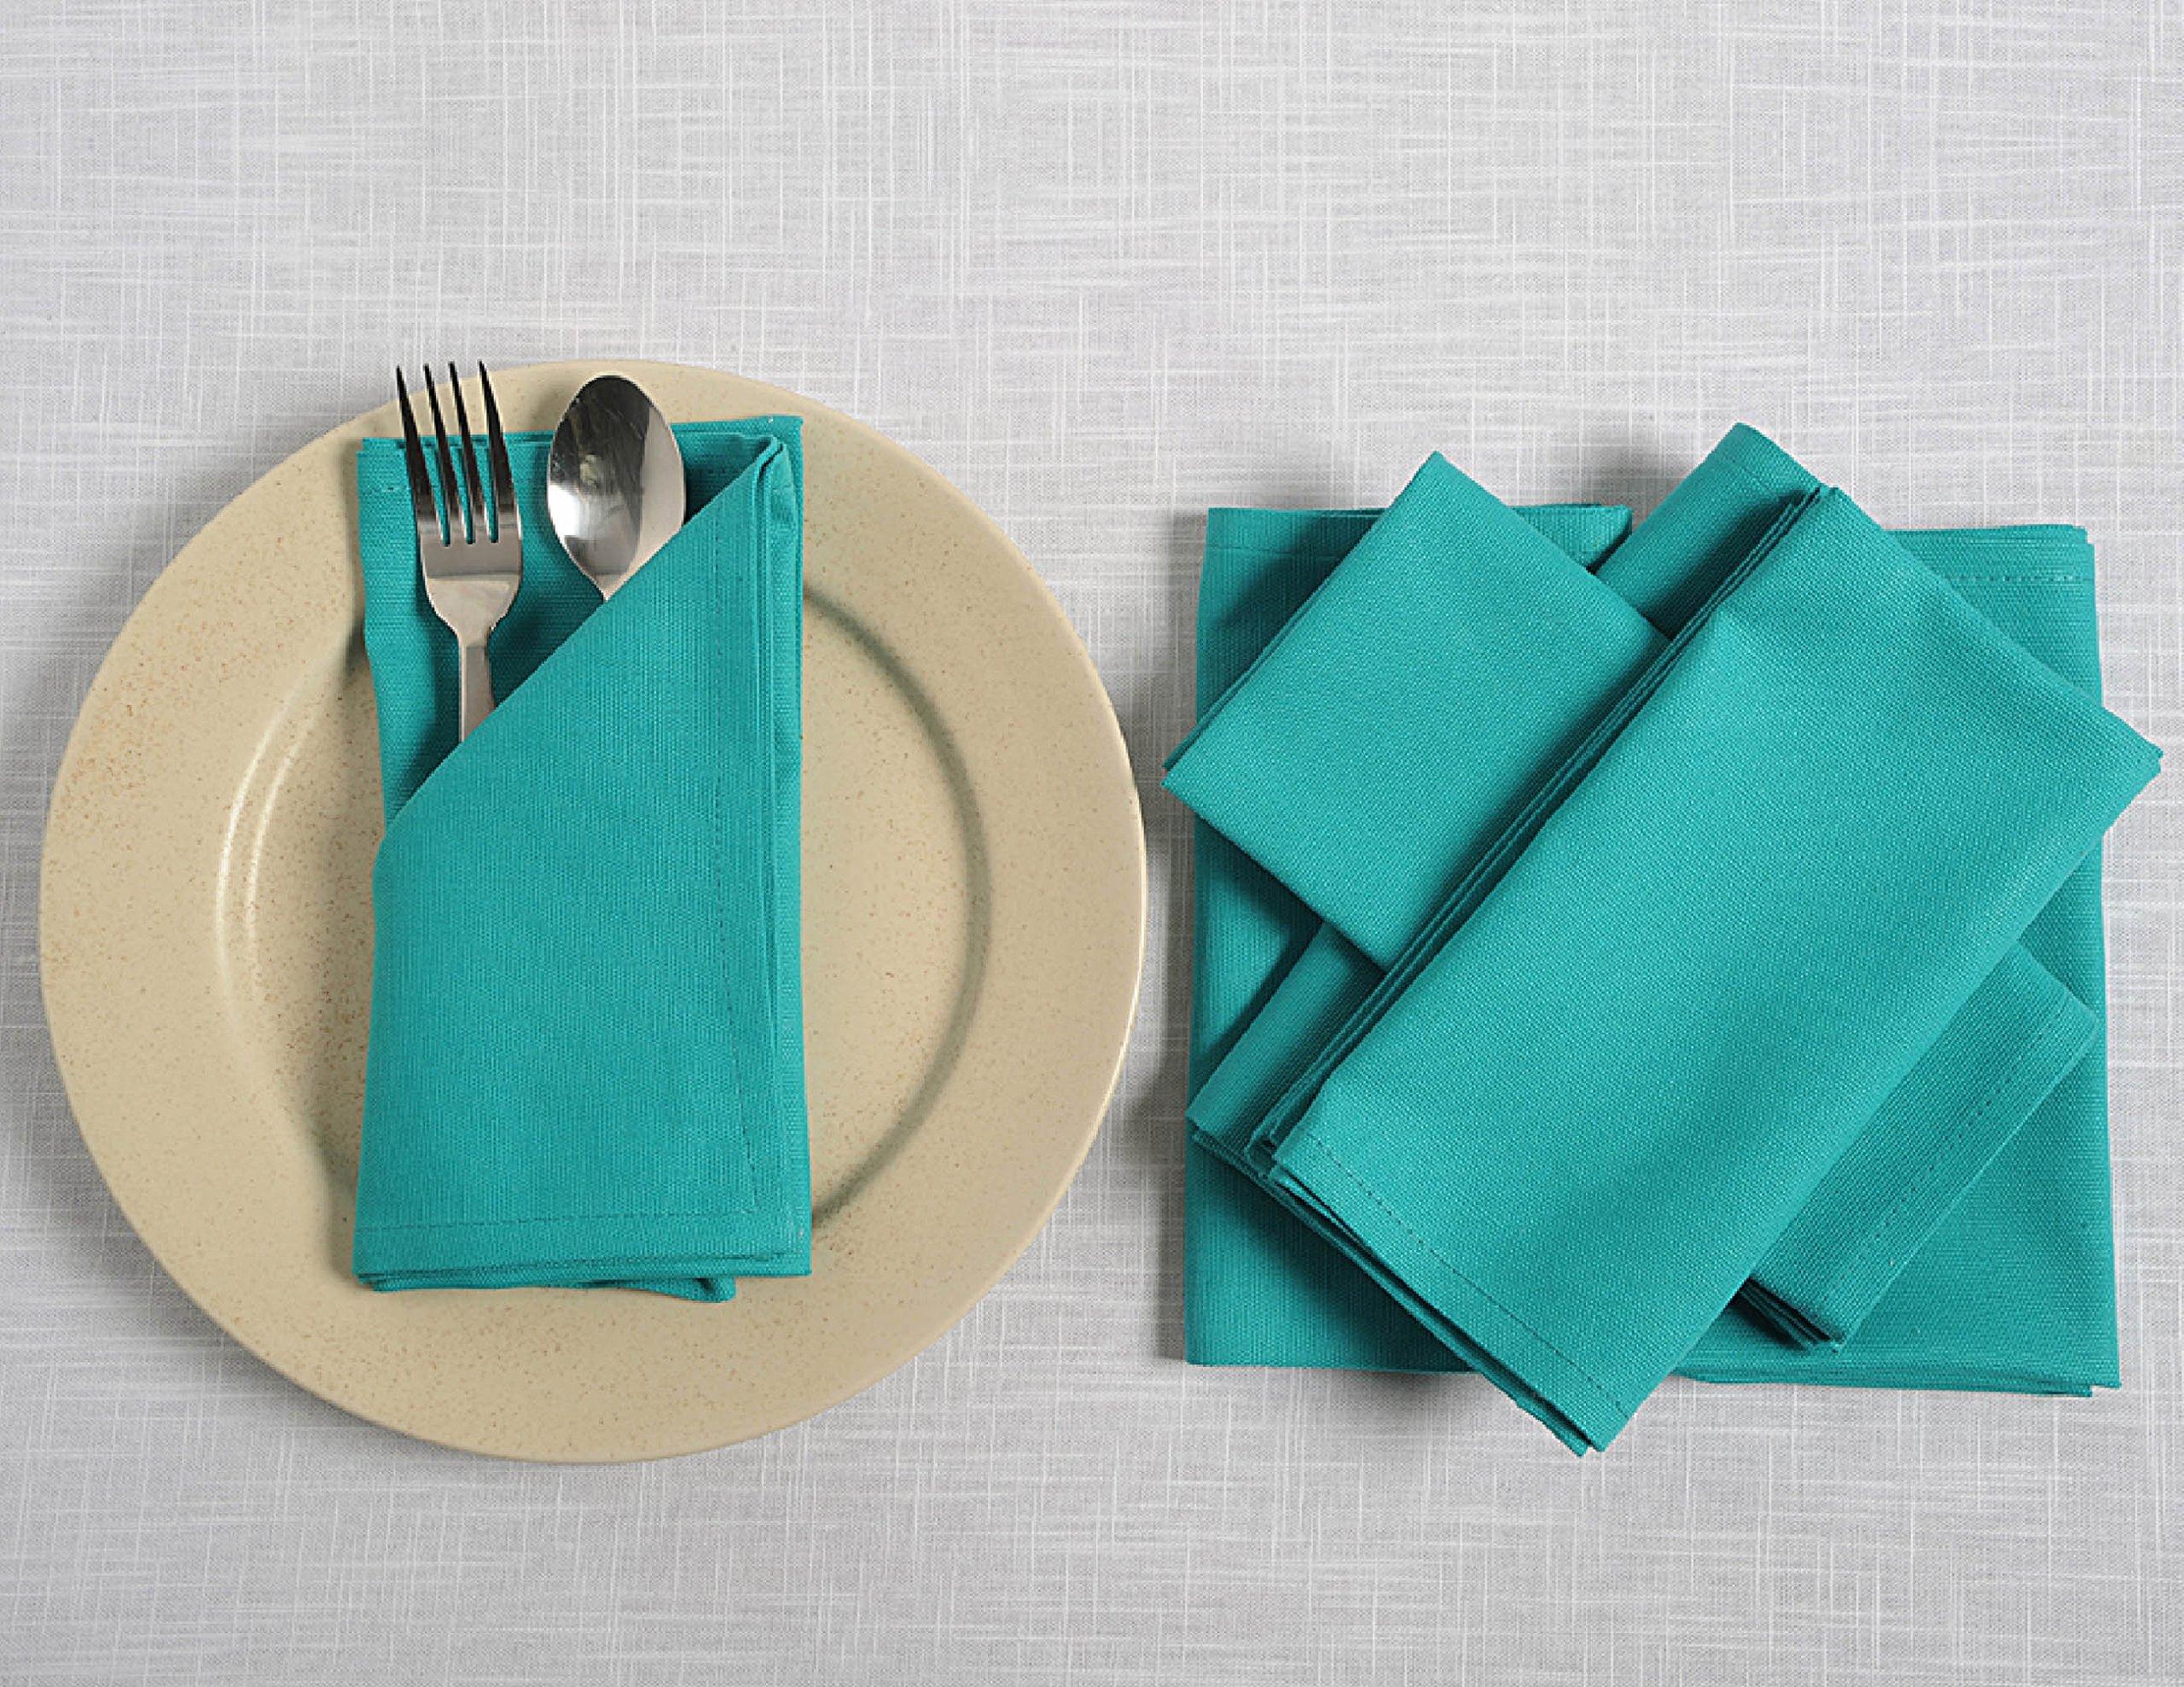 ShalinIndia Cloth Cotton Beverage Napkins - 10'' x 10'' - Aqua - Set of 100 - Perfect for Weddings Parties & Anniversary